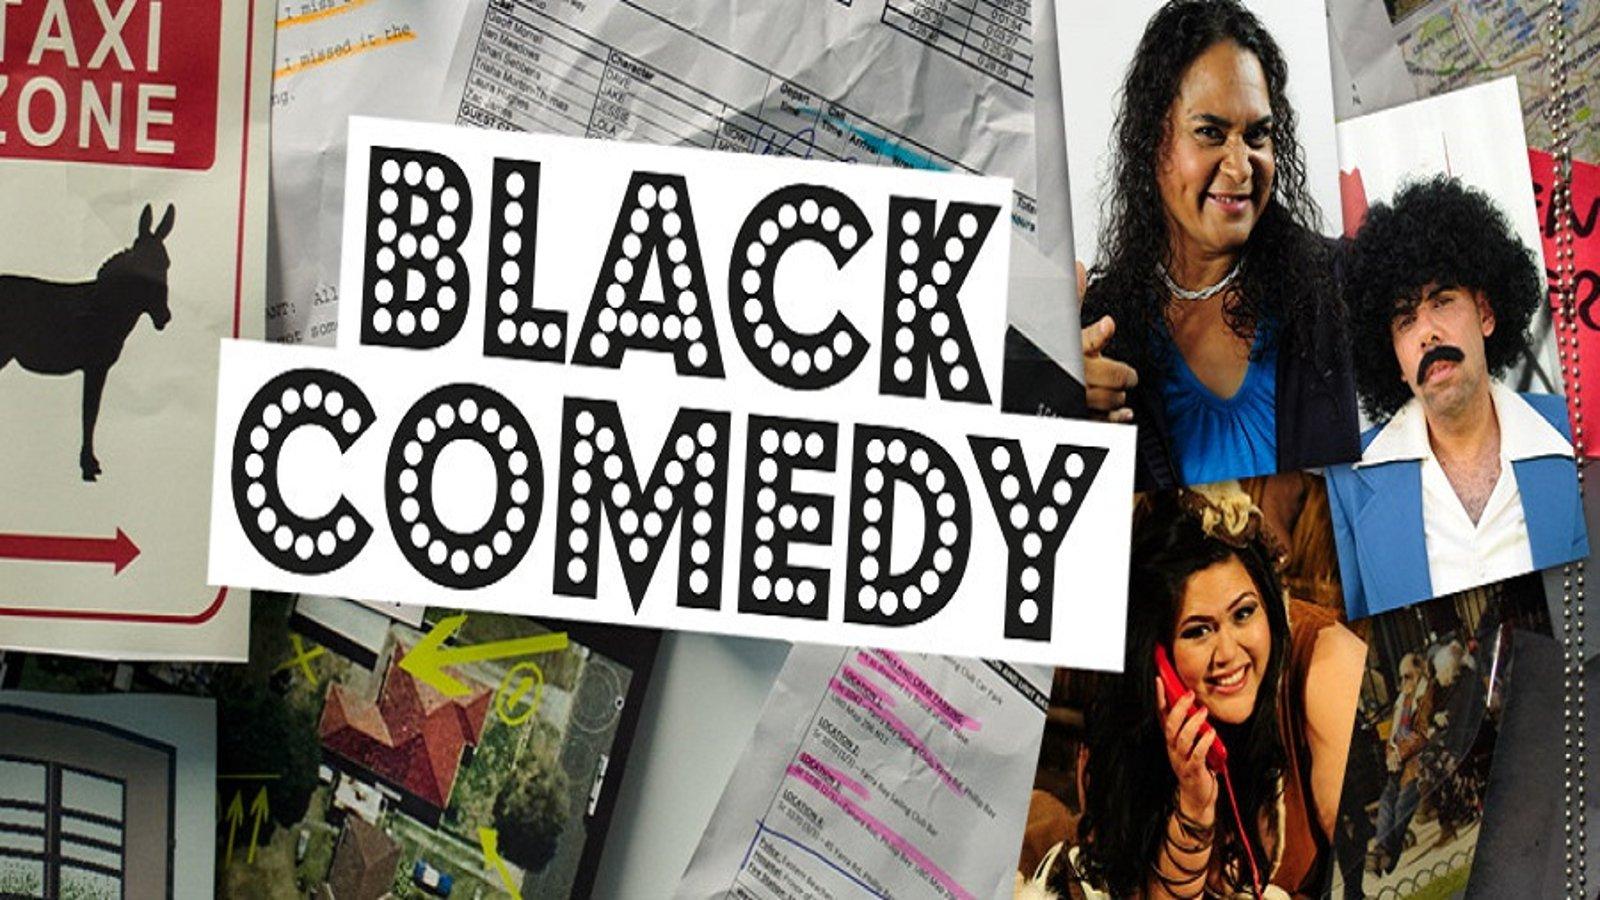 Black Comedy: Series One